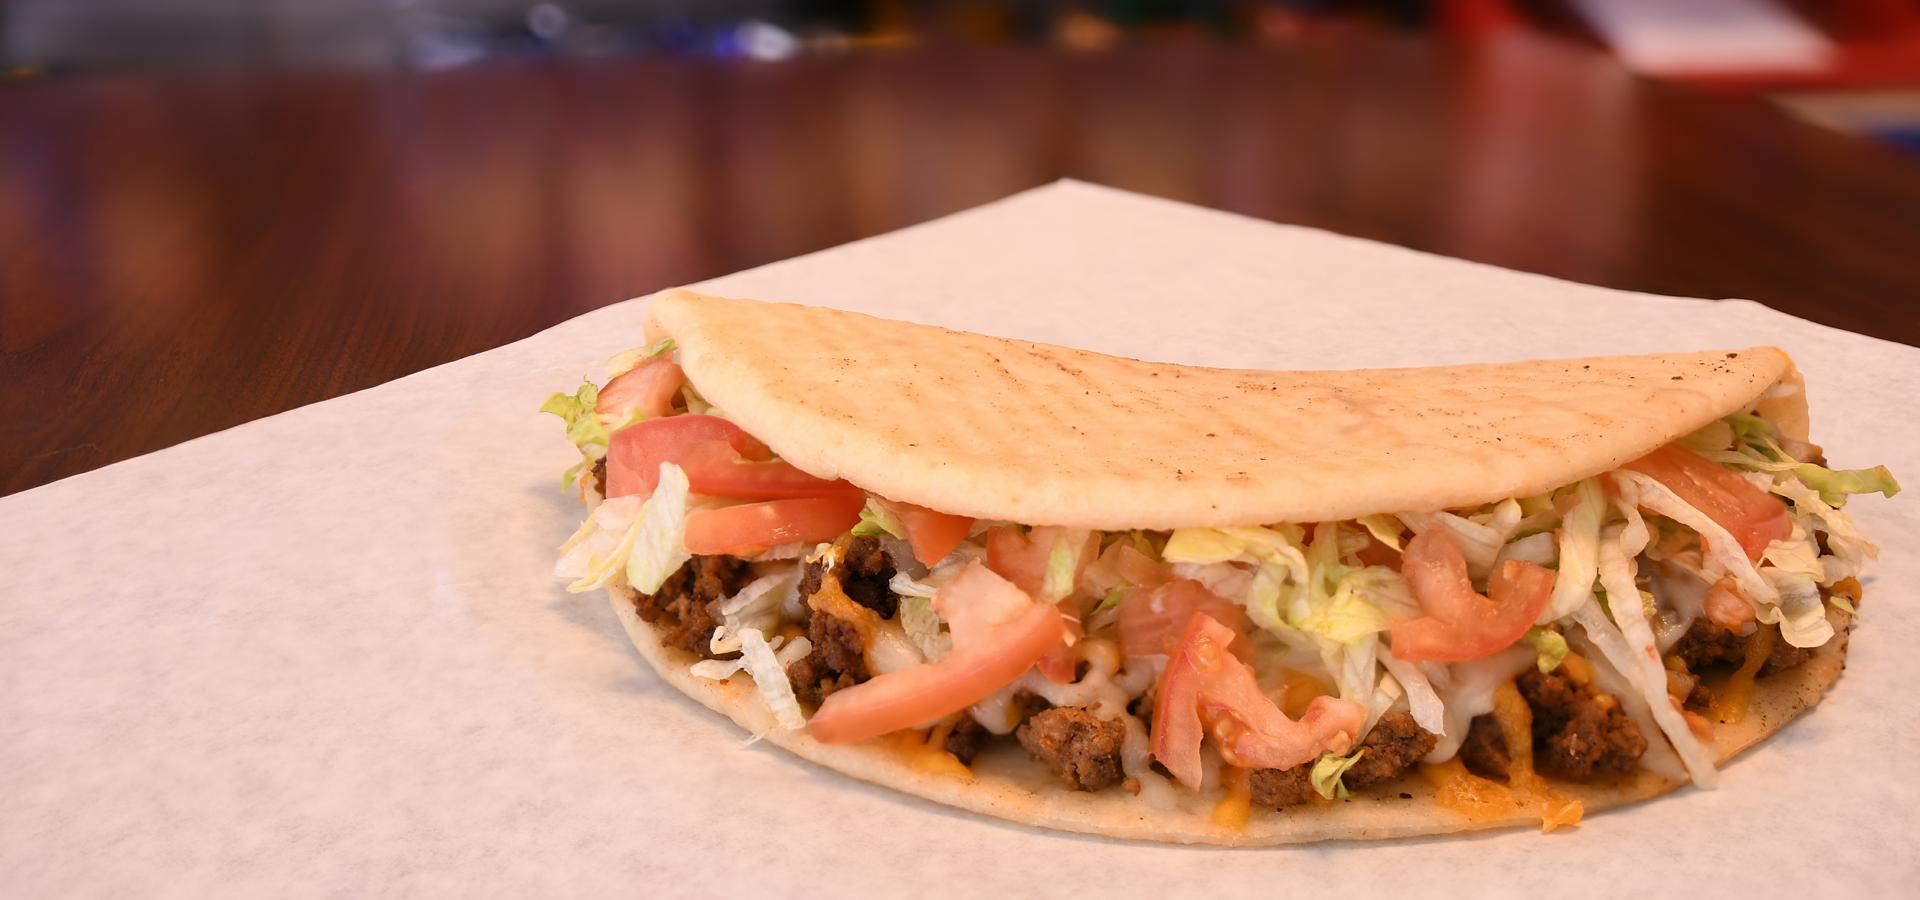 Beef taco with veggies